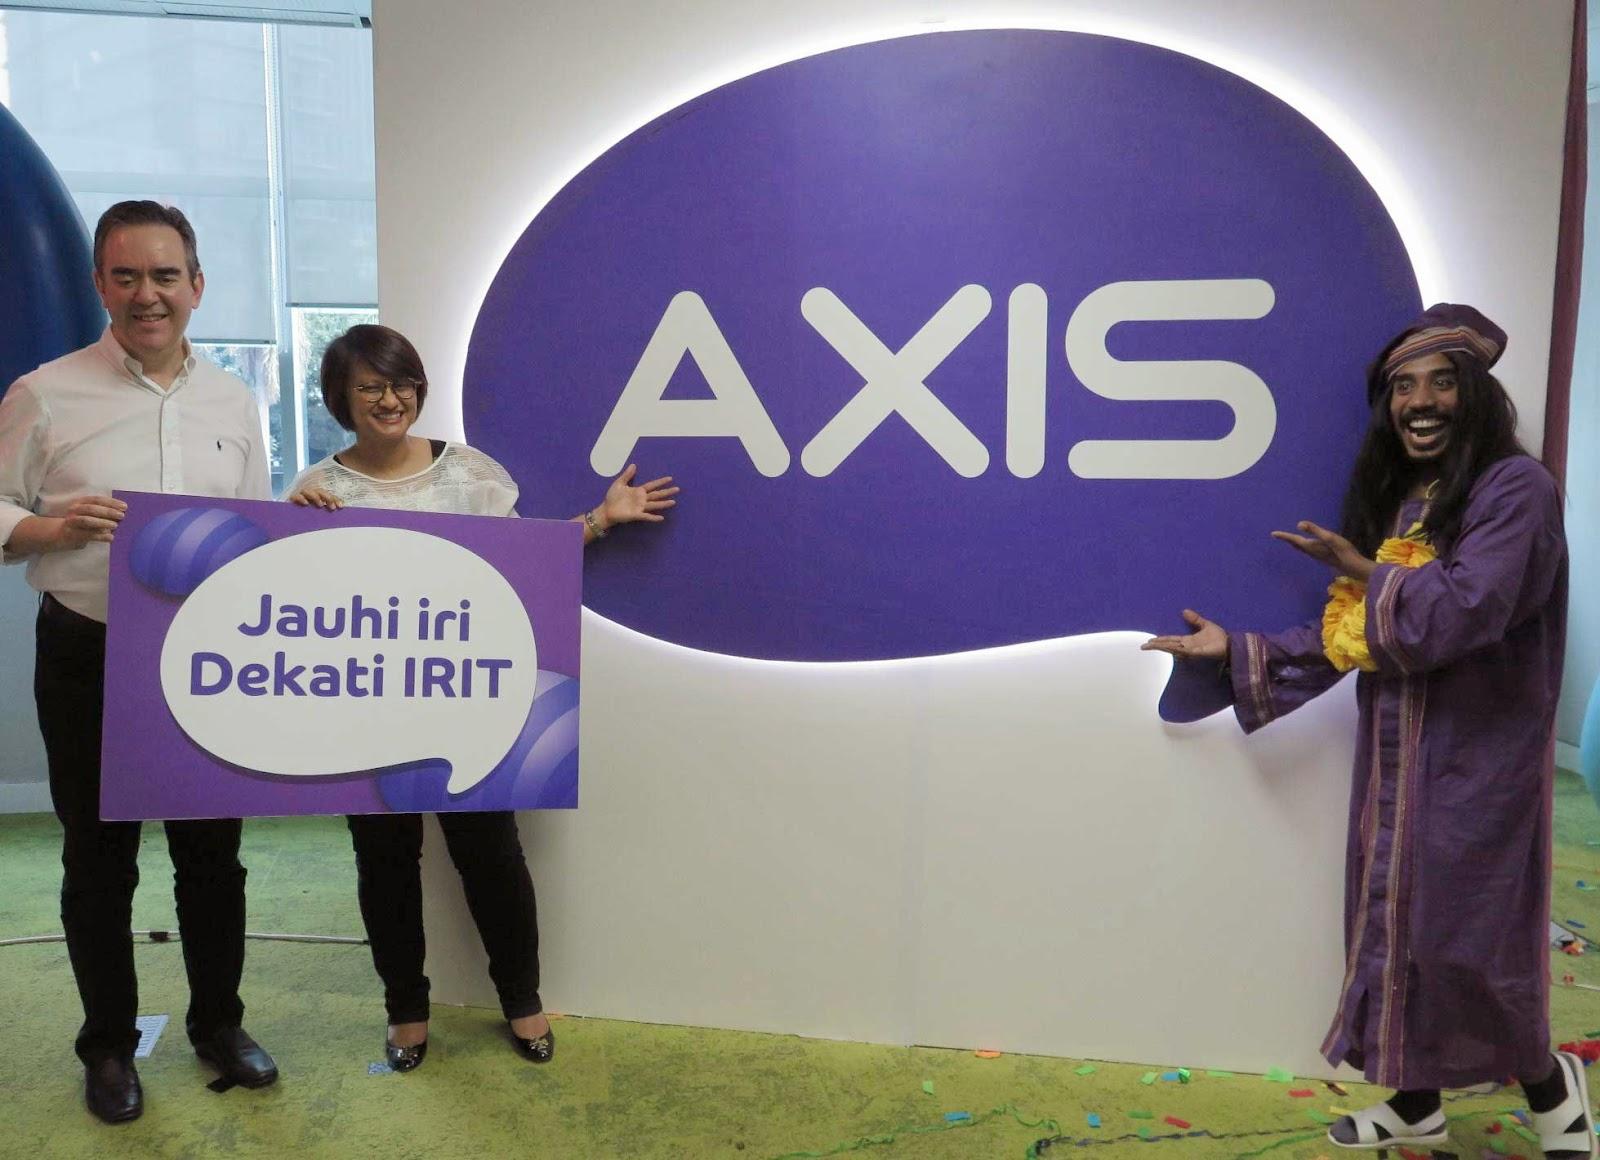 Axis Luncurkan Iritology